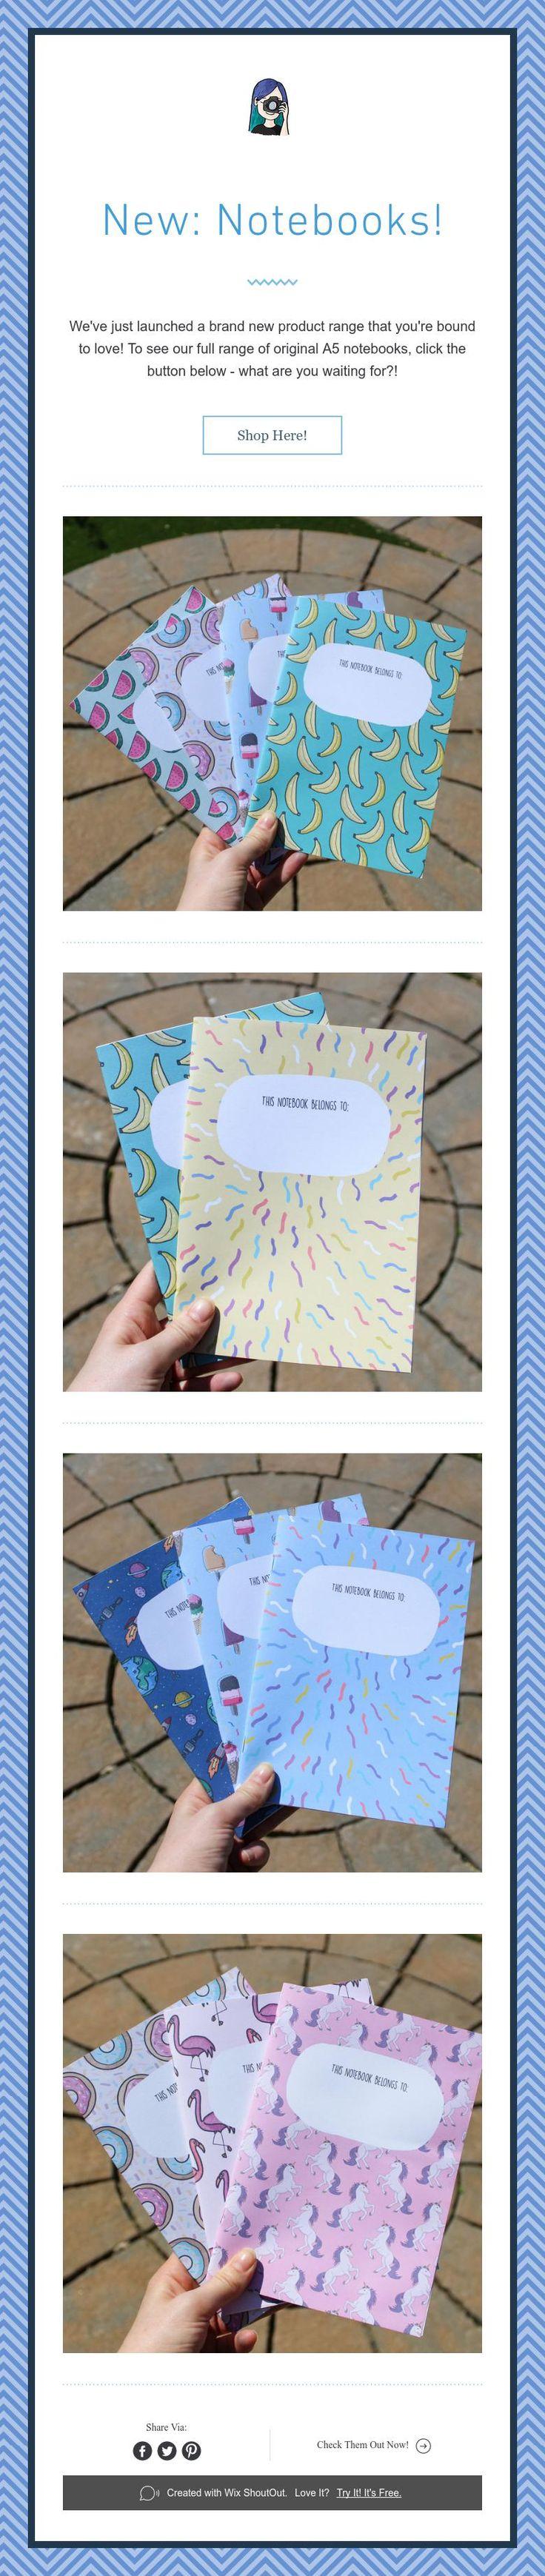 New: Notebooks!